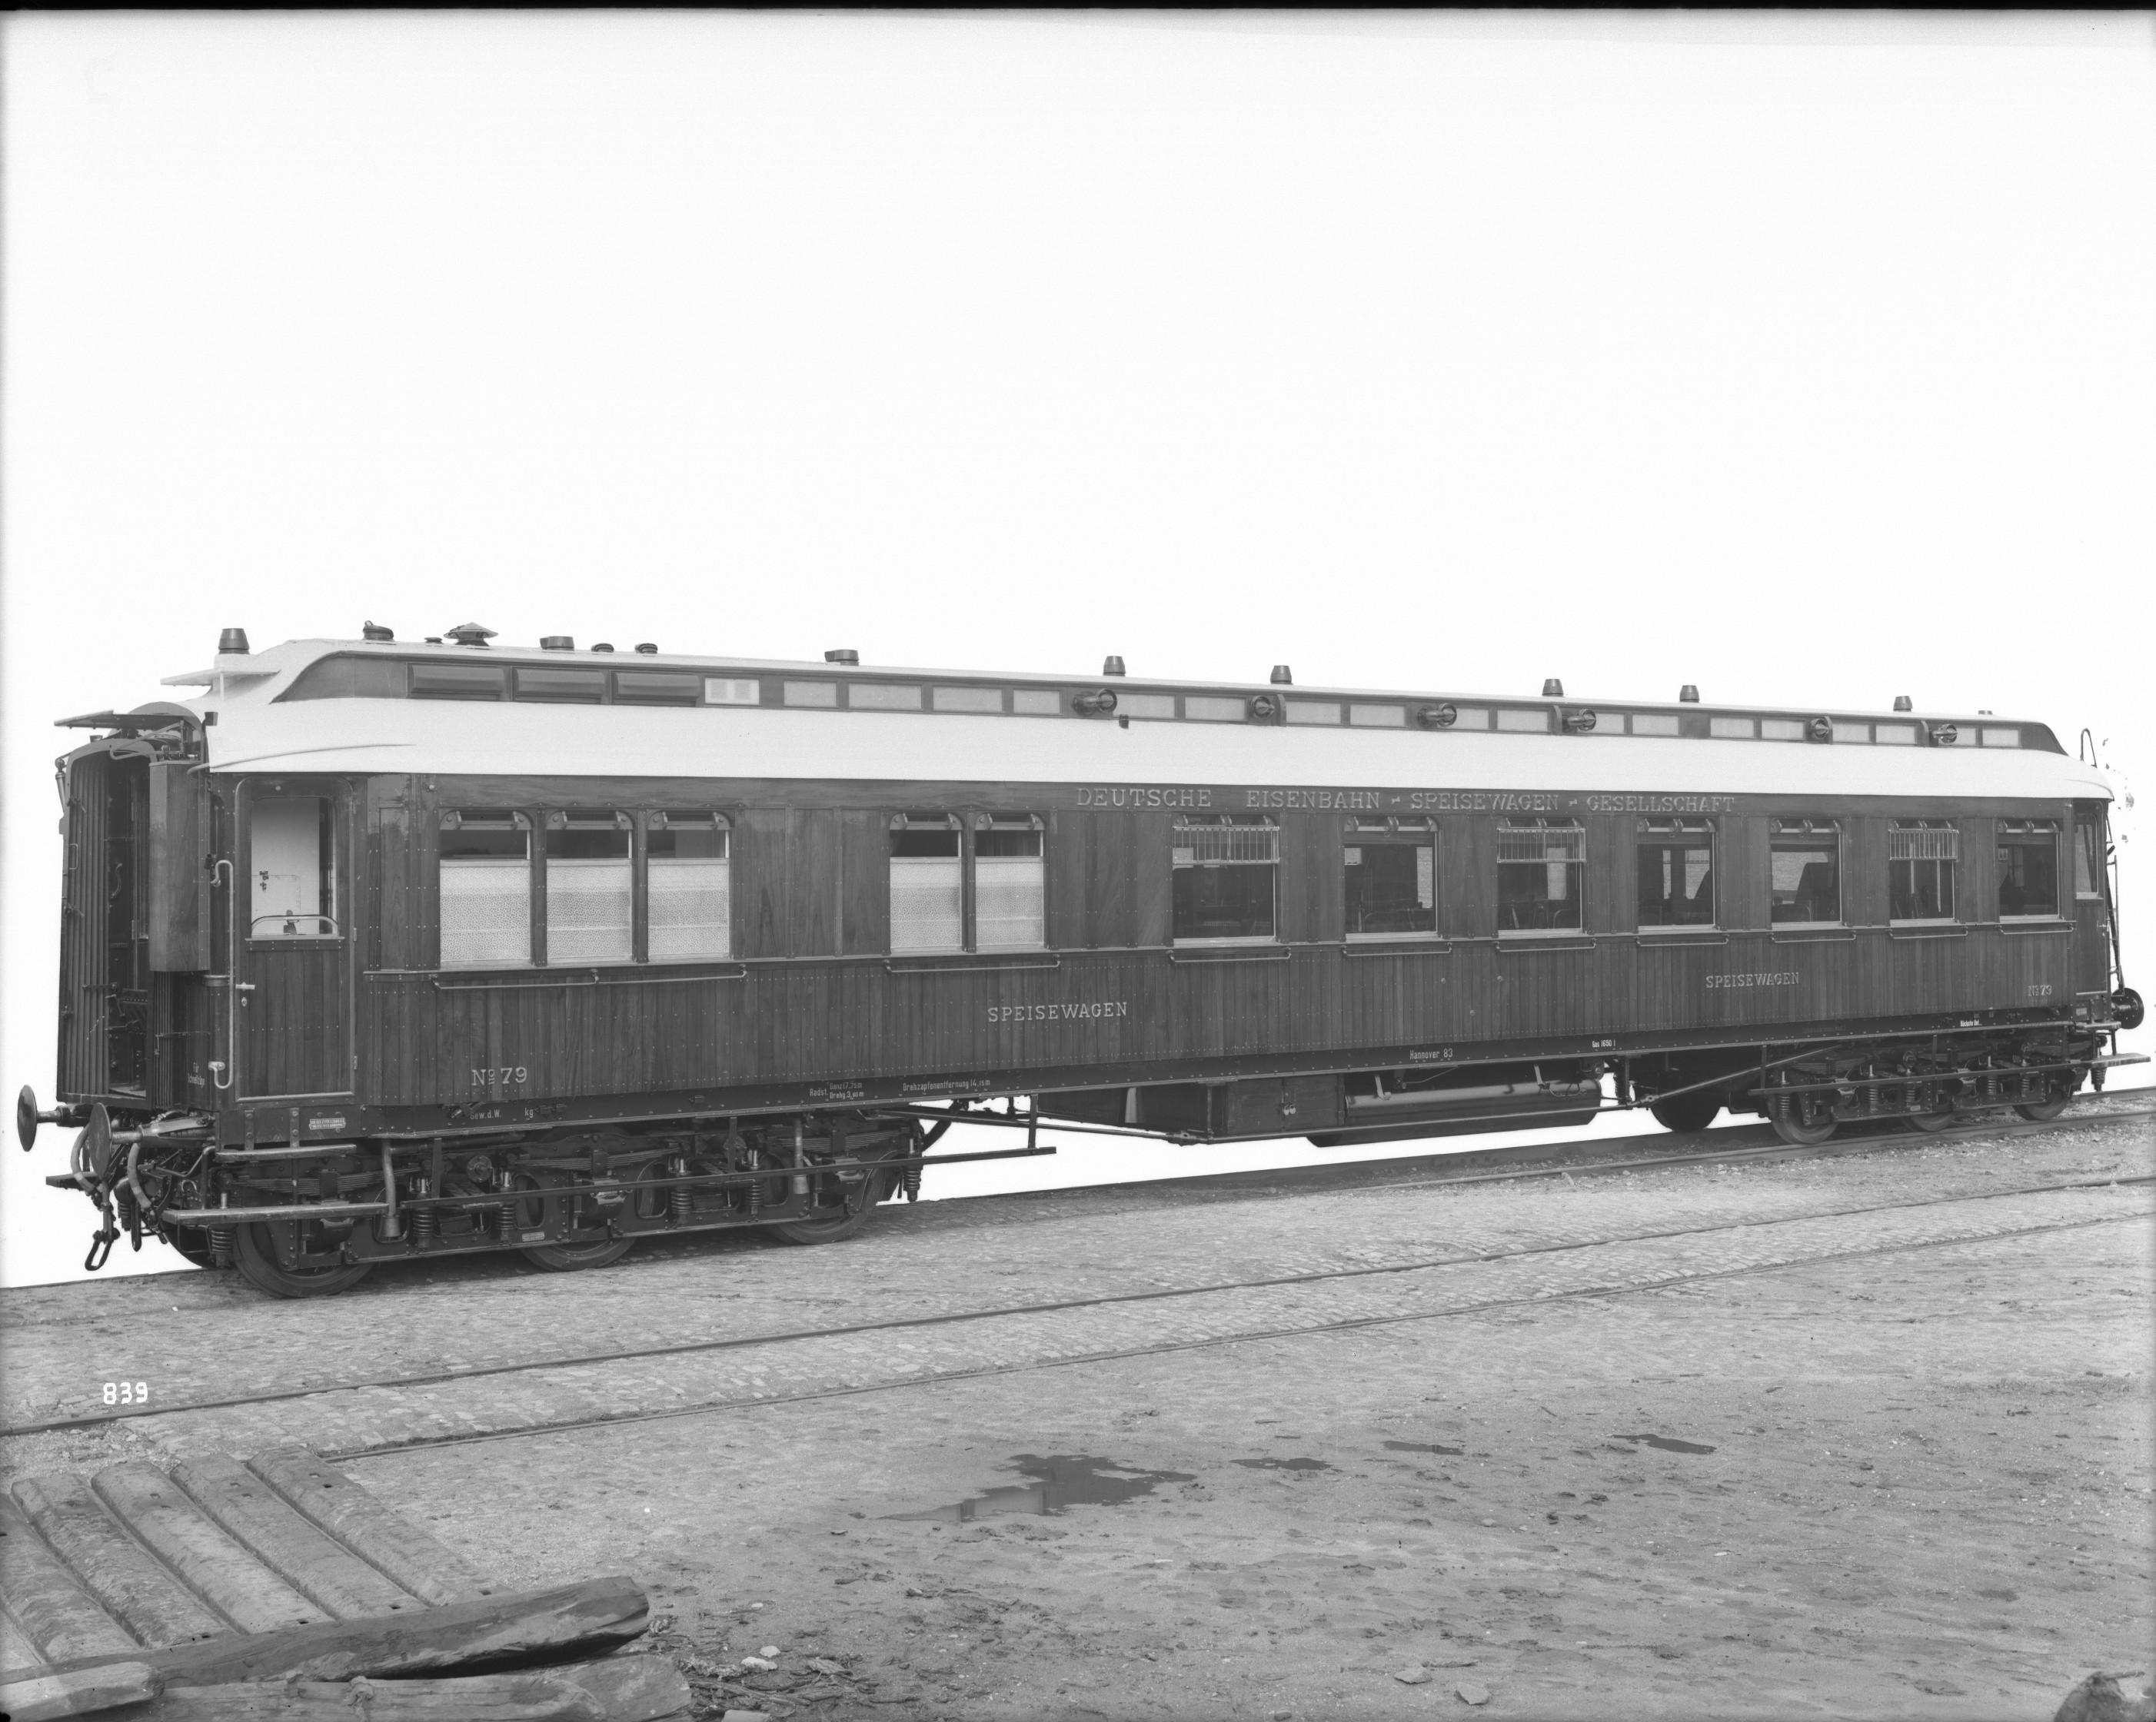 Speisewagen WR6, Nr. 79, Teakholzaufbau der D.E.S.G. (Deutsche Eisenbahn-Speisewagen-Gesellschaft), 1907